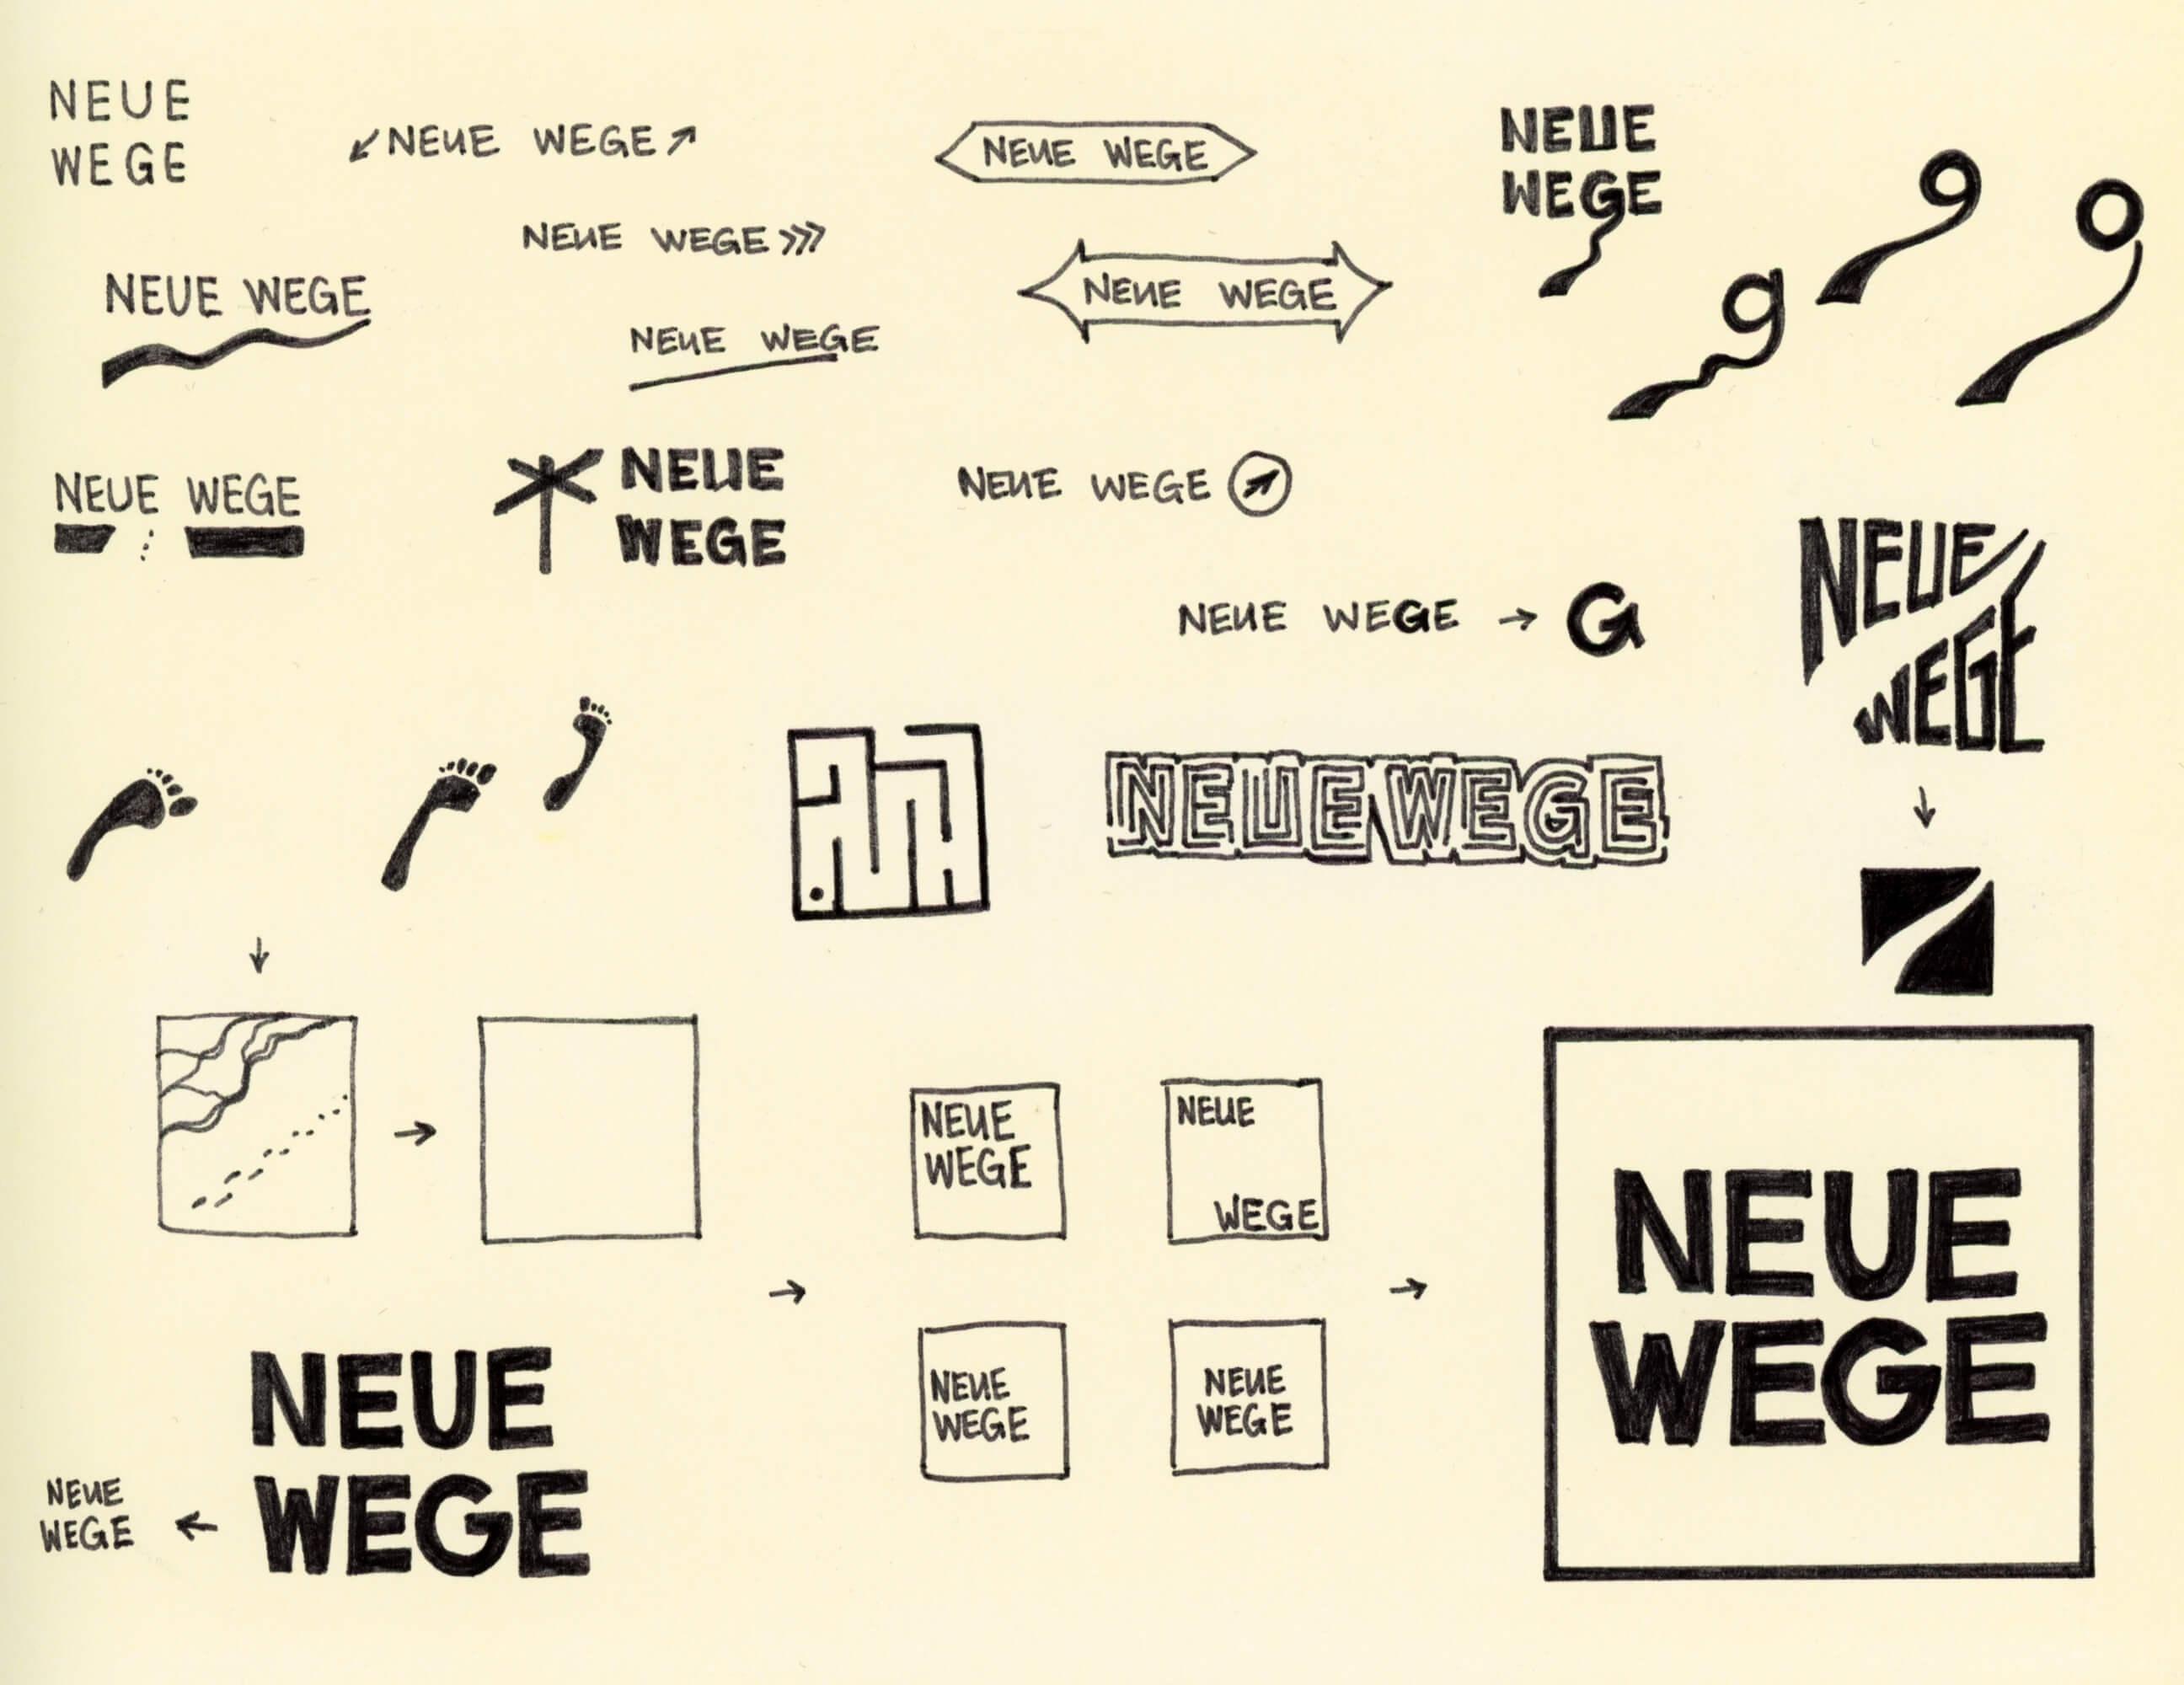 neue wege sketches